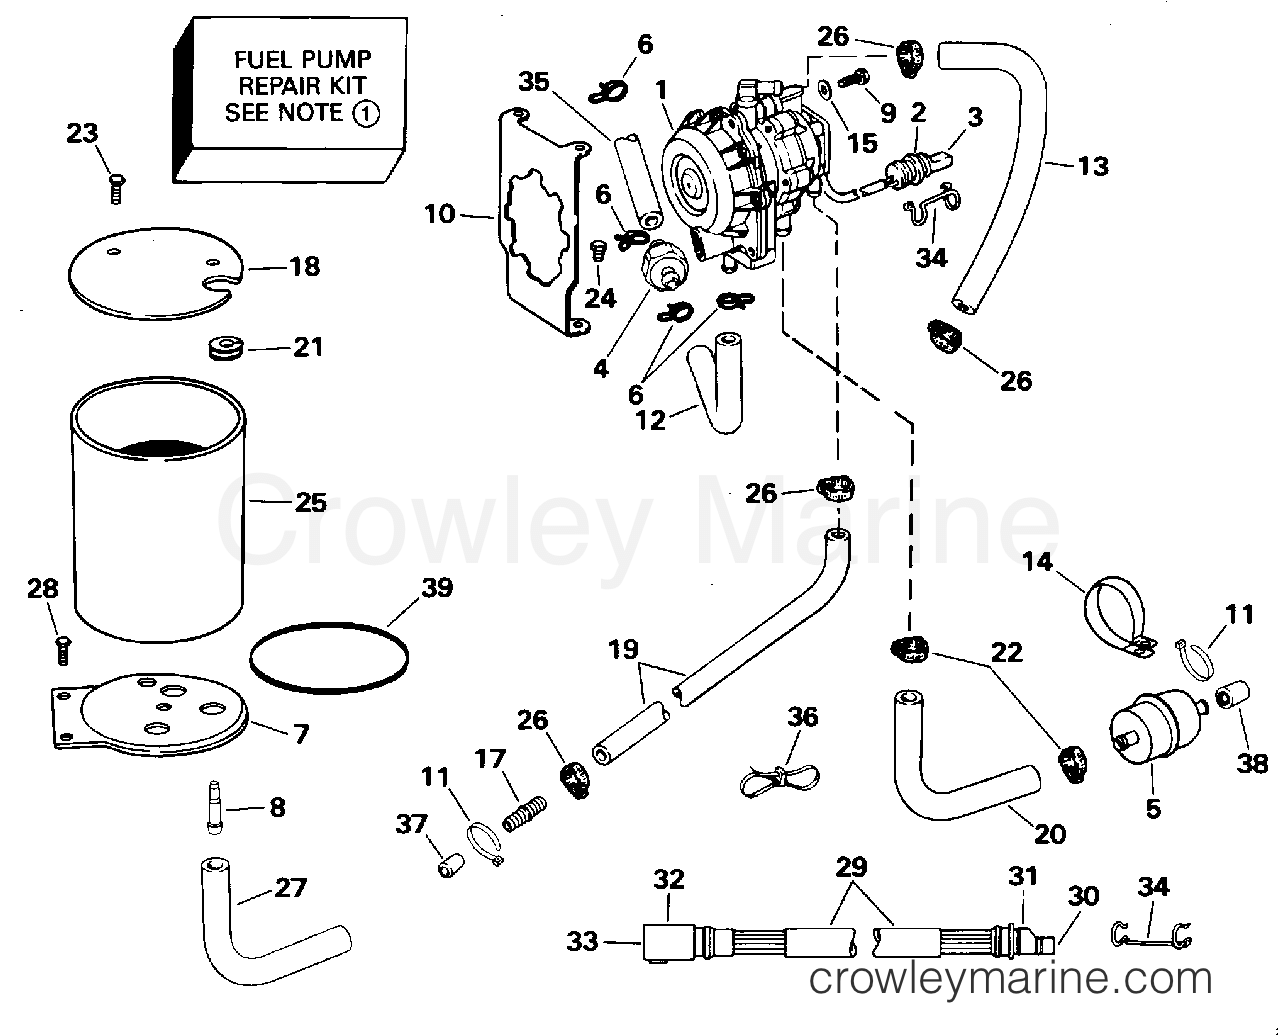 hight resolution of wiring diagram omc 115 turbojet wiring diagrams u2022 omc throttle control diagram wiring diagram omc 115 turbojet